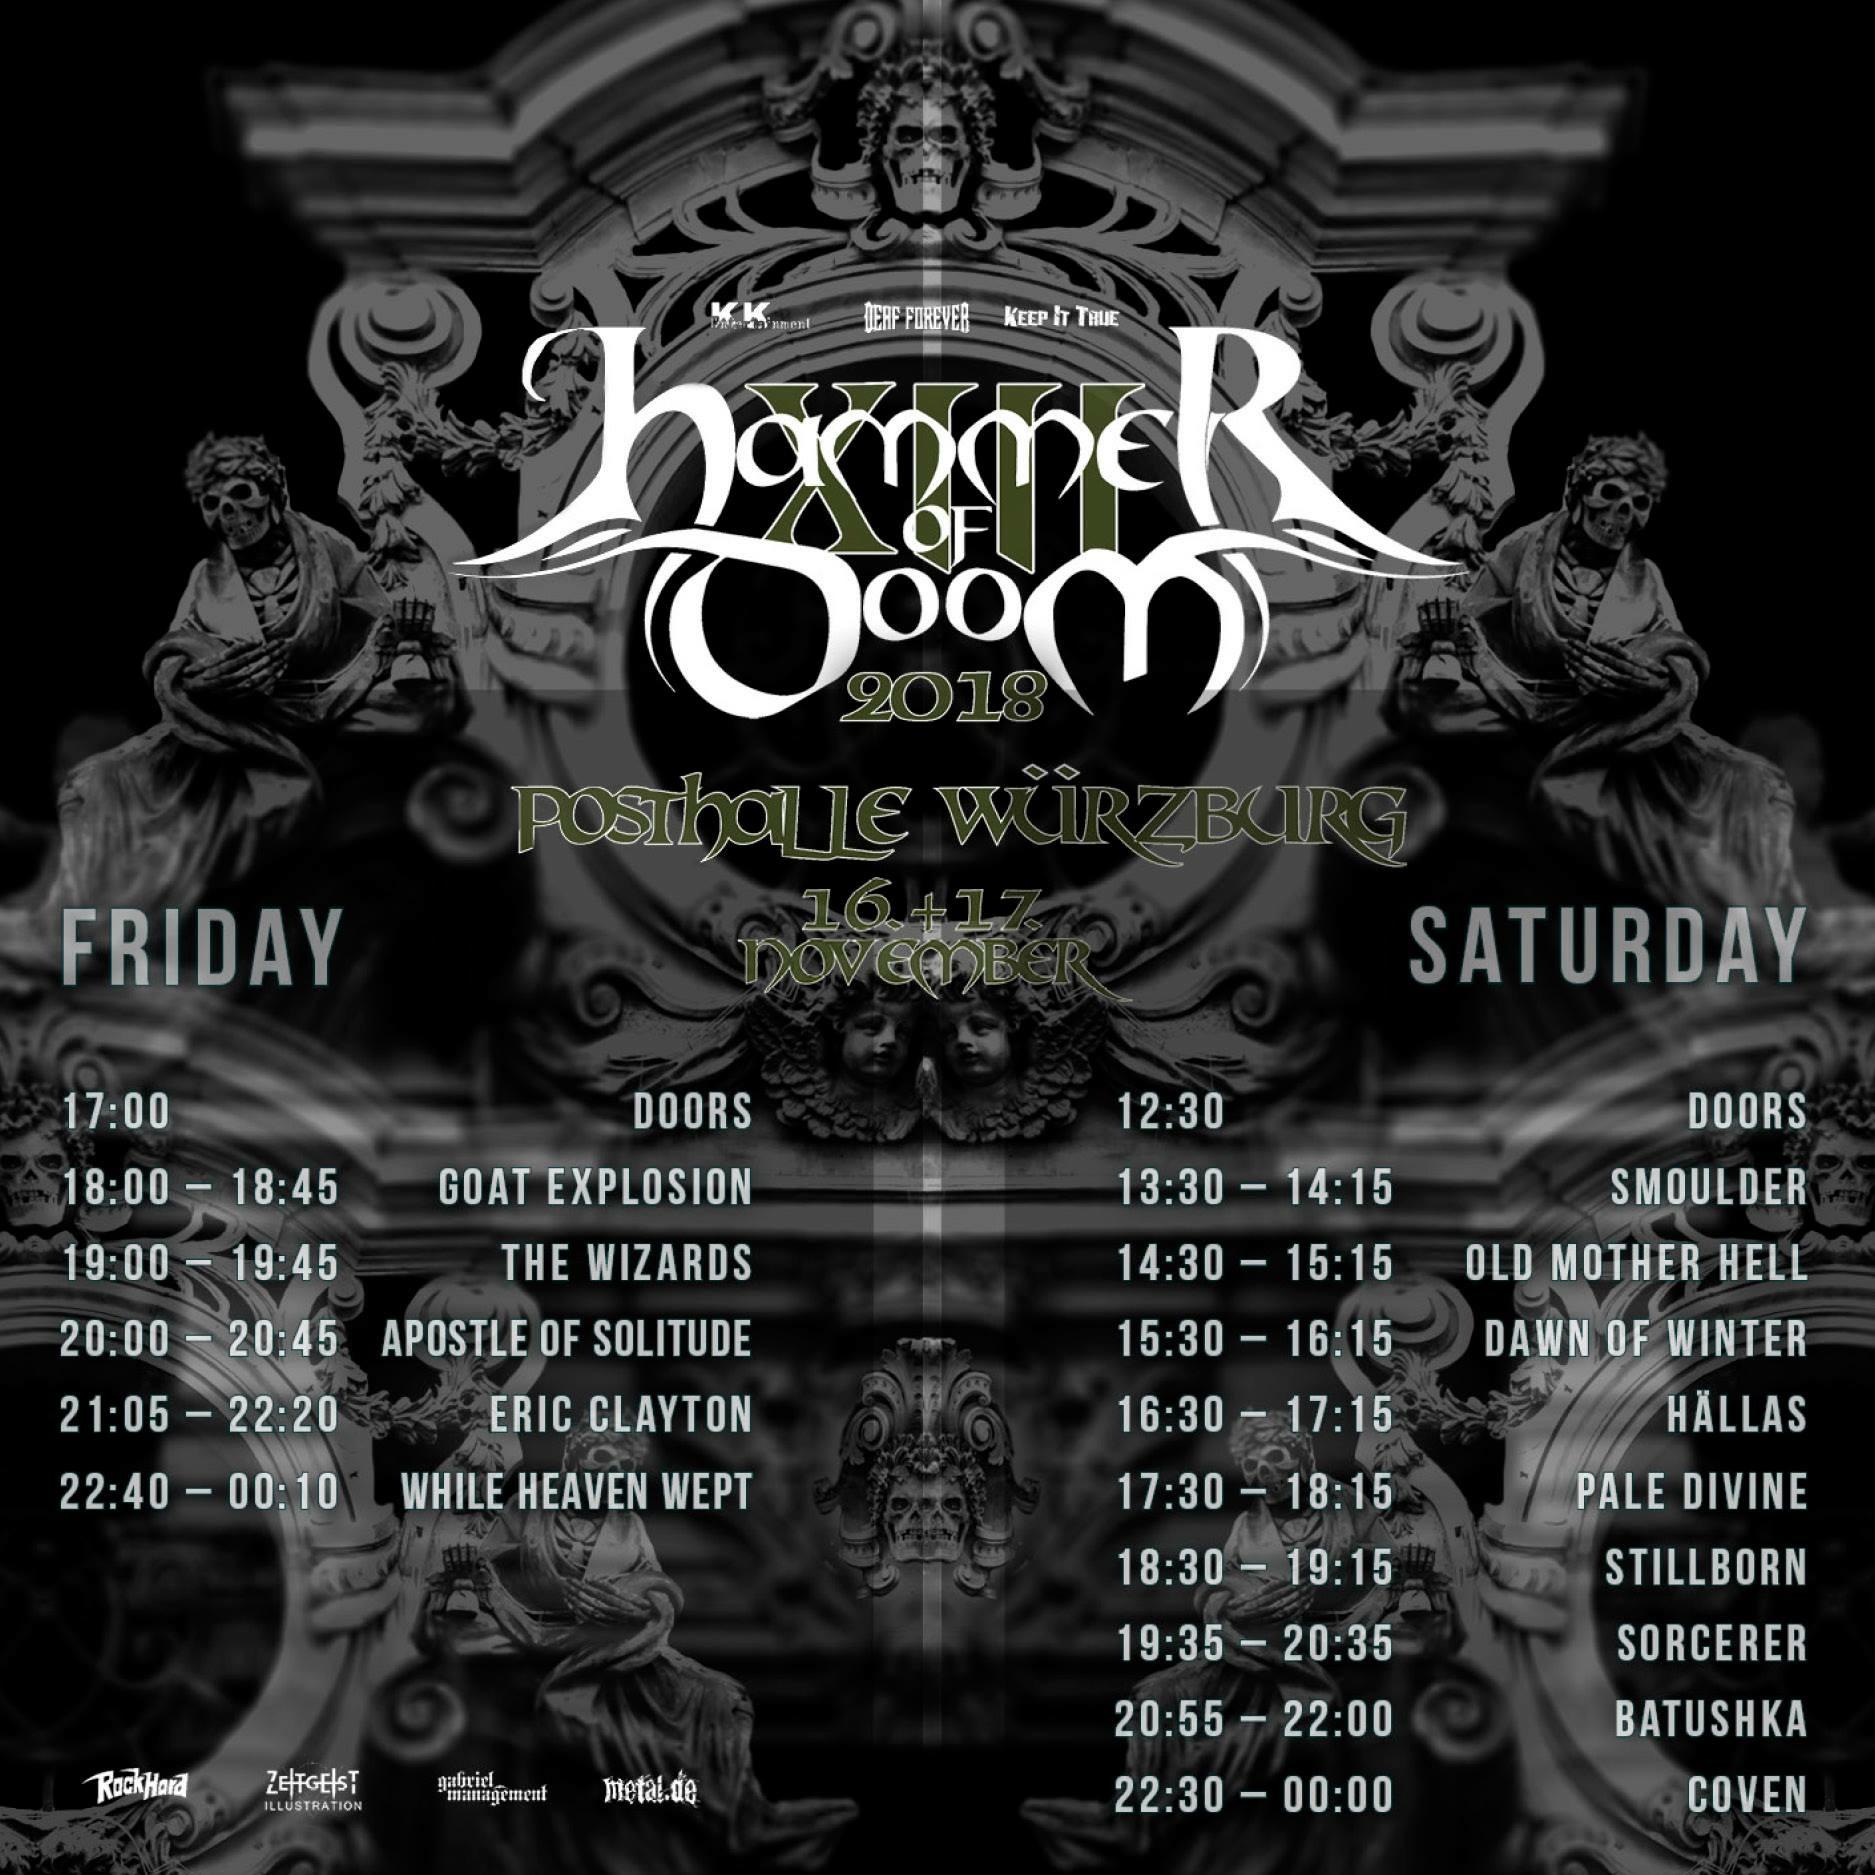 Hammer of Doom XIII